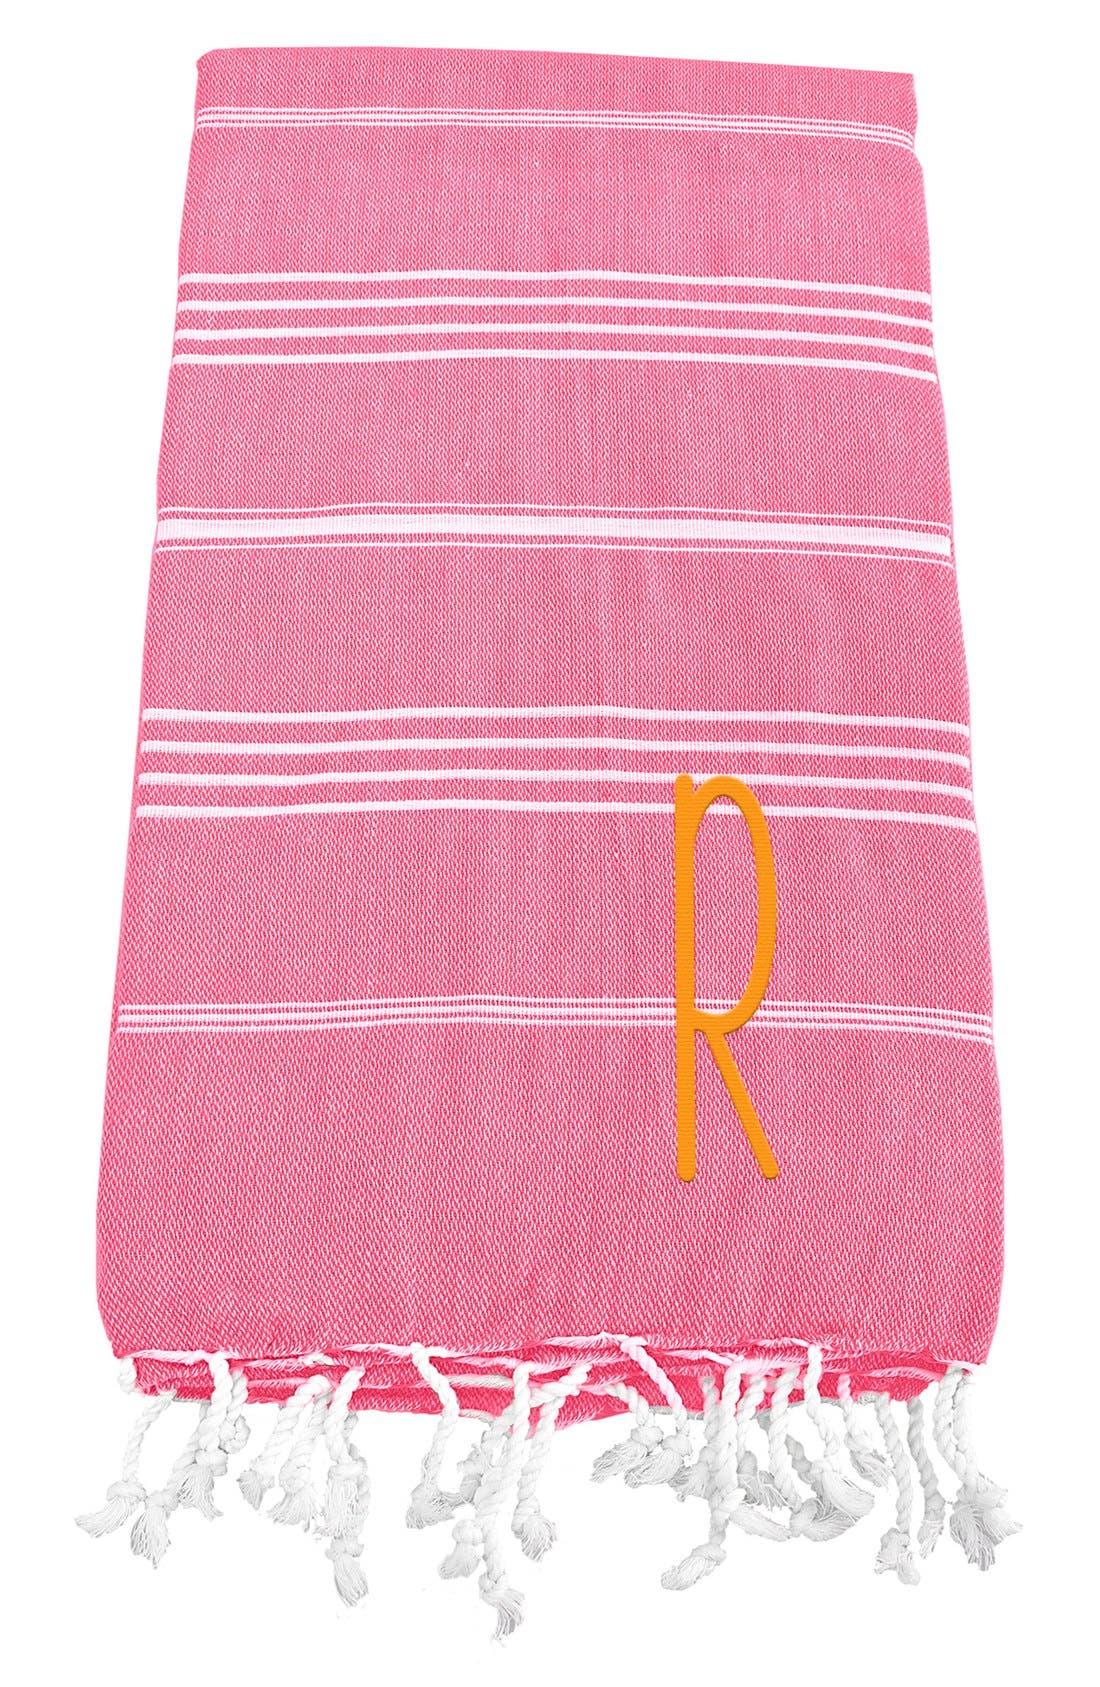 Monogram Turkish Cotton Towel,                             Main thumbnail 154, color,